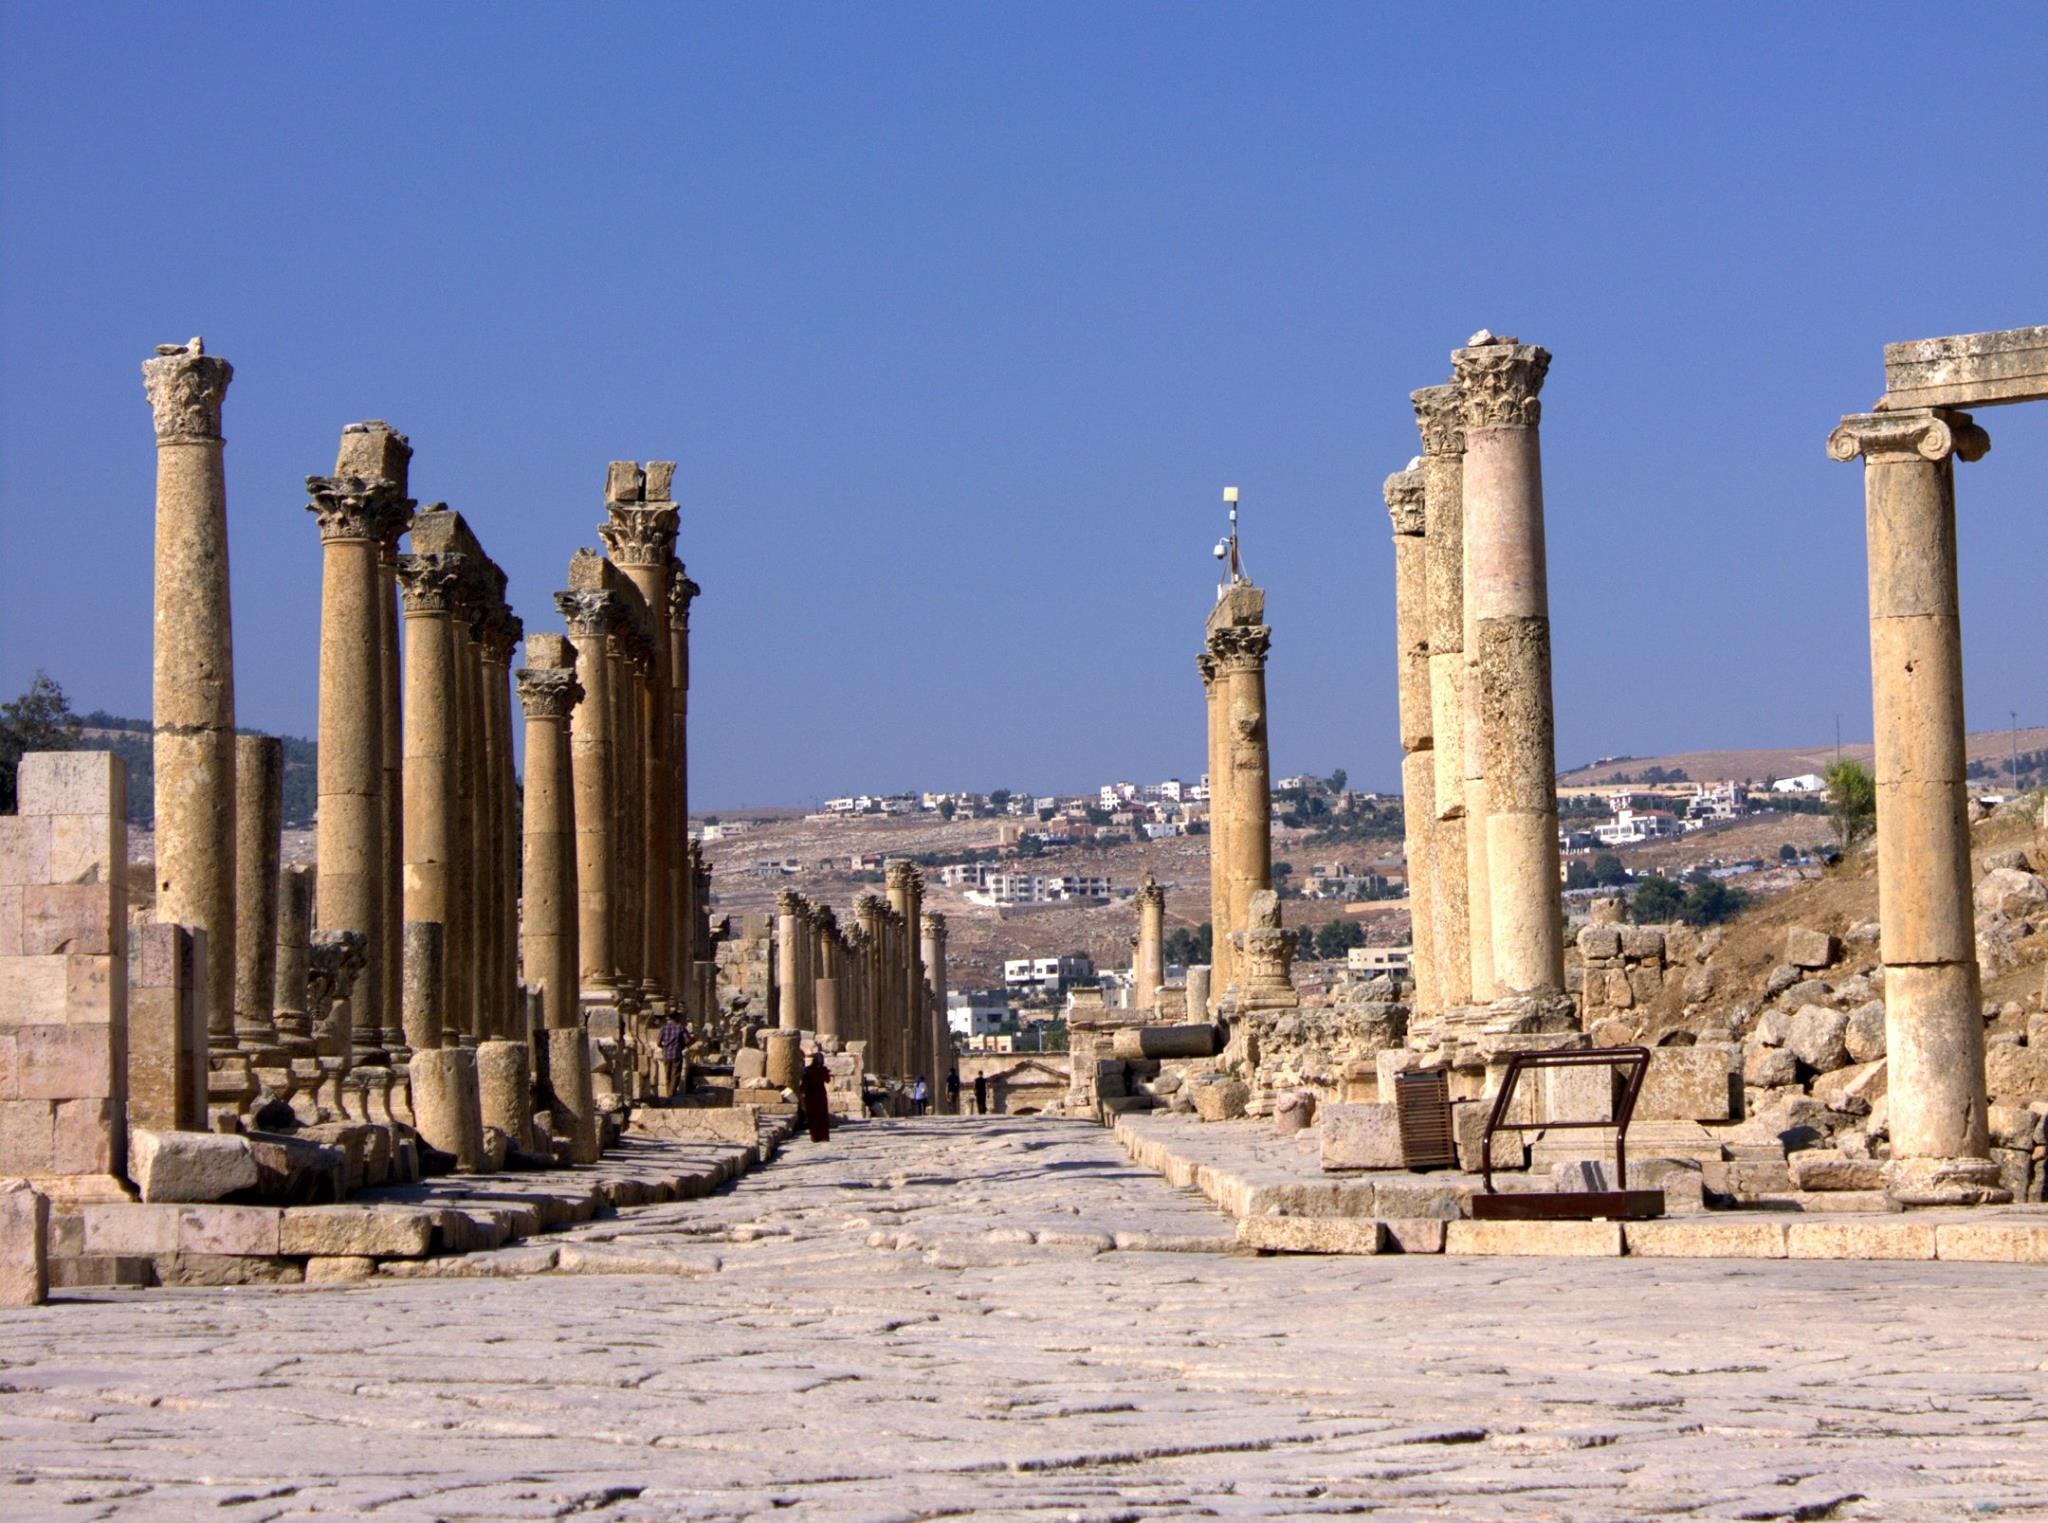 #Jordantourism #Jerash